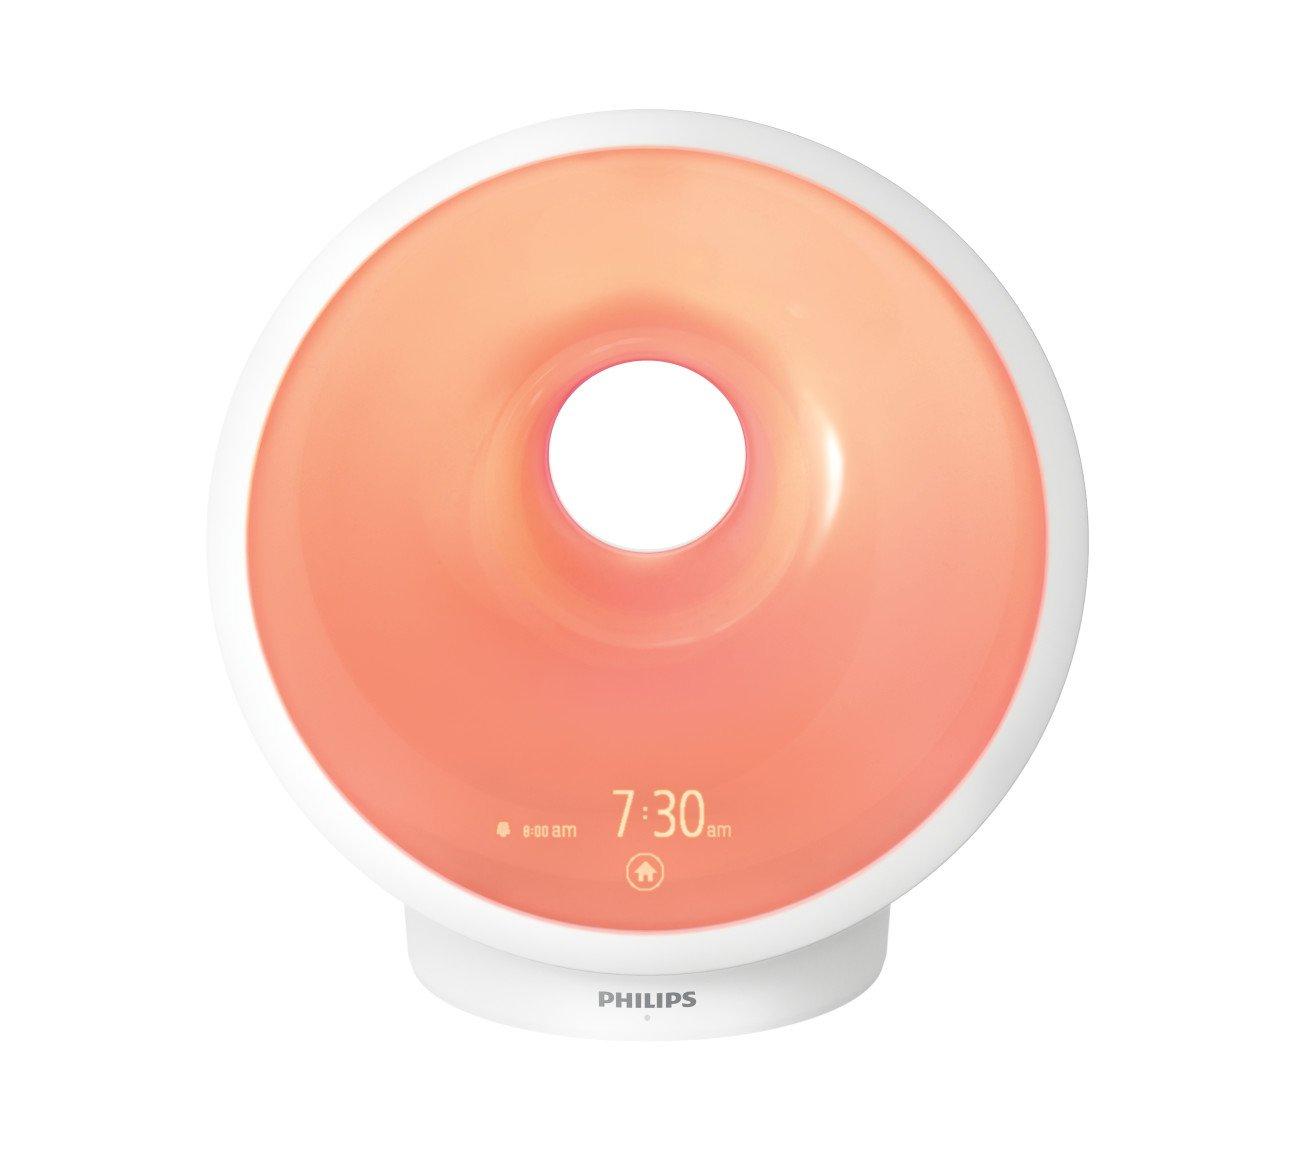 Philips Somneo Sunrise Wake Up and Sleep Therapy Light with Sunrise Alarm and Sunset Fading Night Light, White HF3650/60